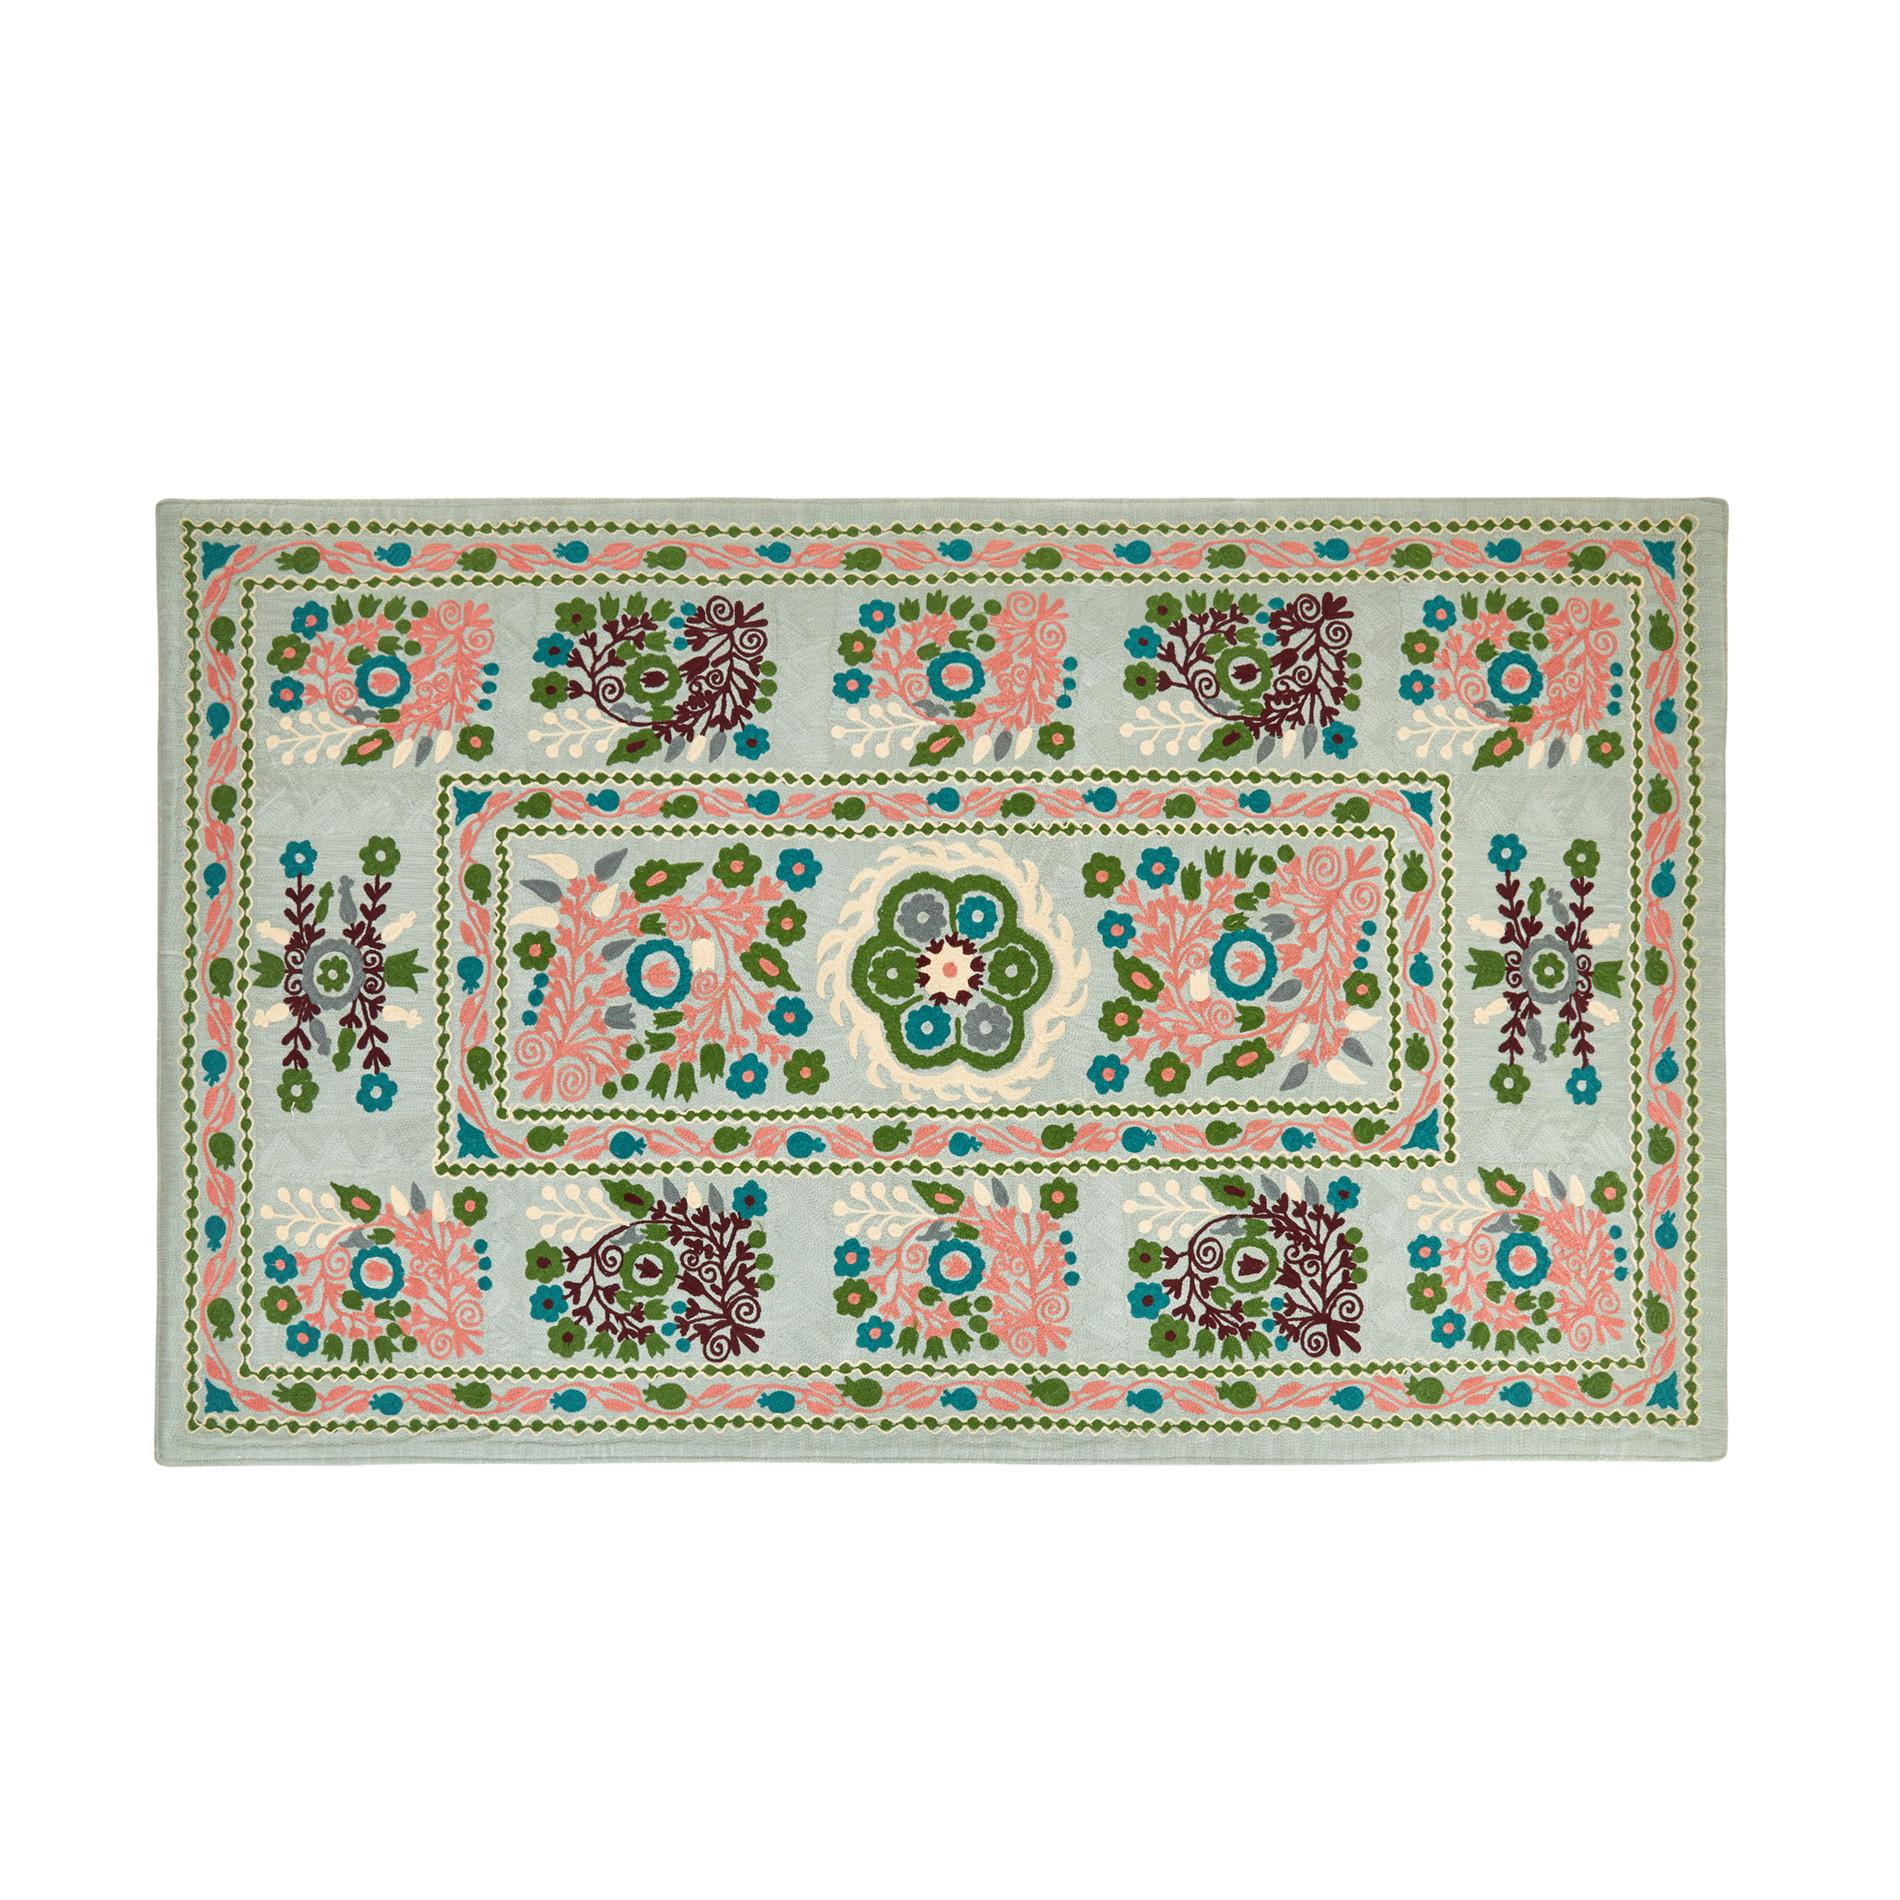 Tappeto puro cotone motivo floreale in lana, Multicolor, large image number 0